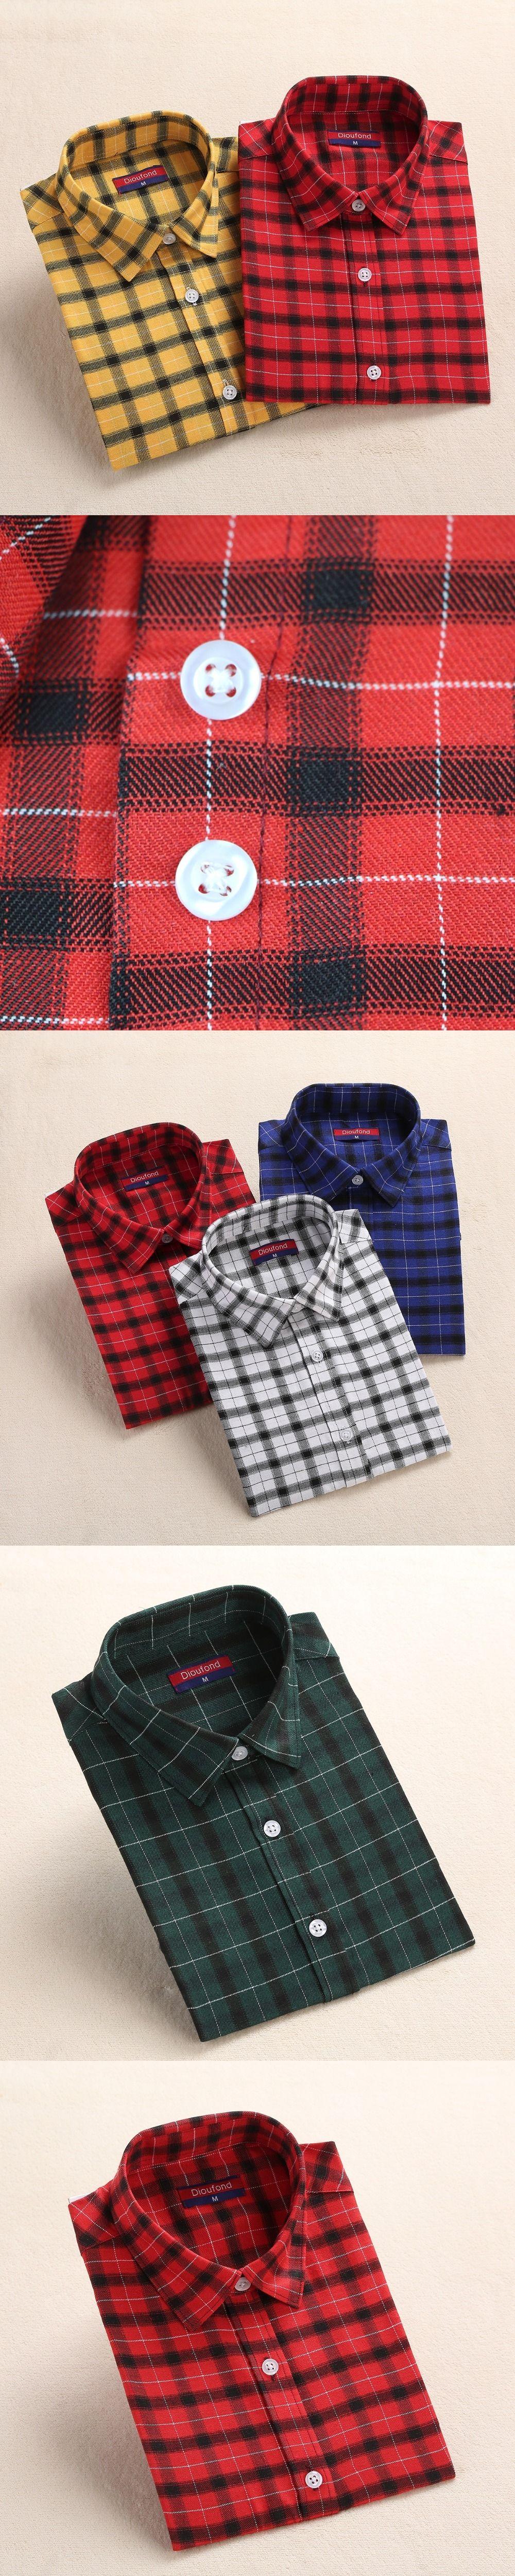 Plus size womens flannel shirt  Dioufond Women Flannel Plaid Shirt  Autumn Long Sleeve Blouse